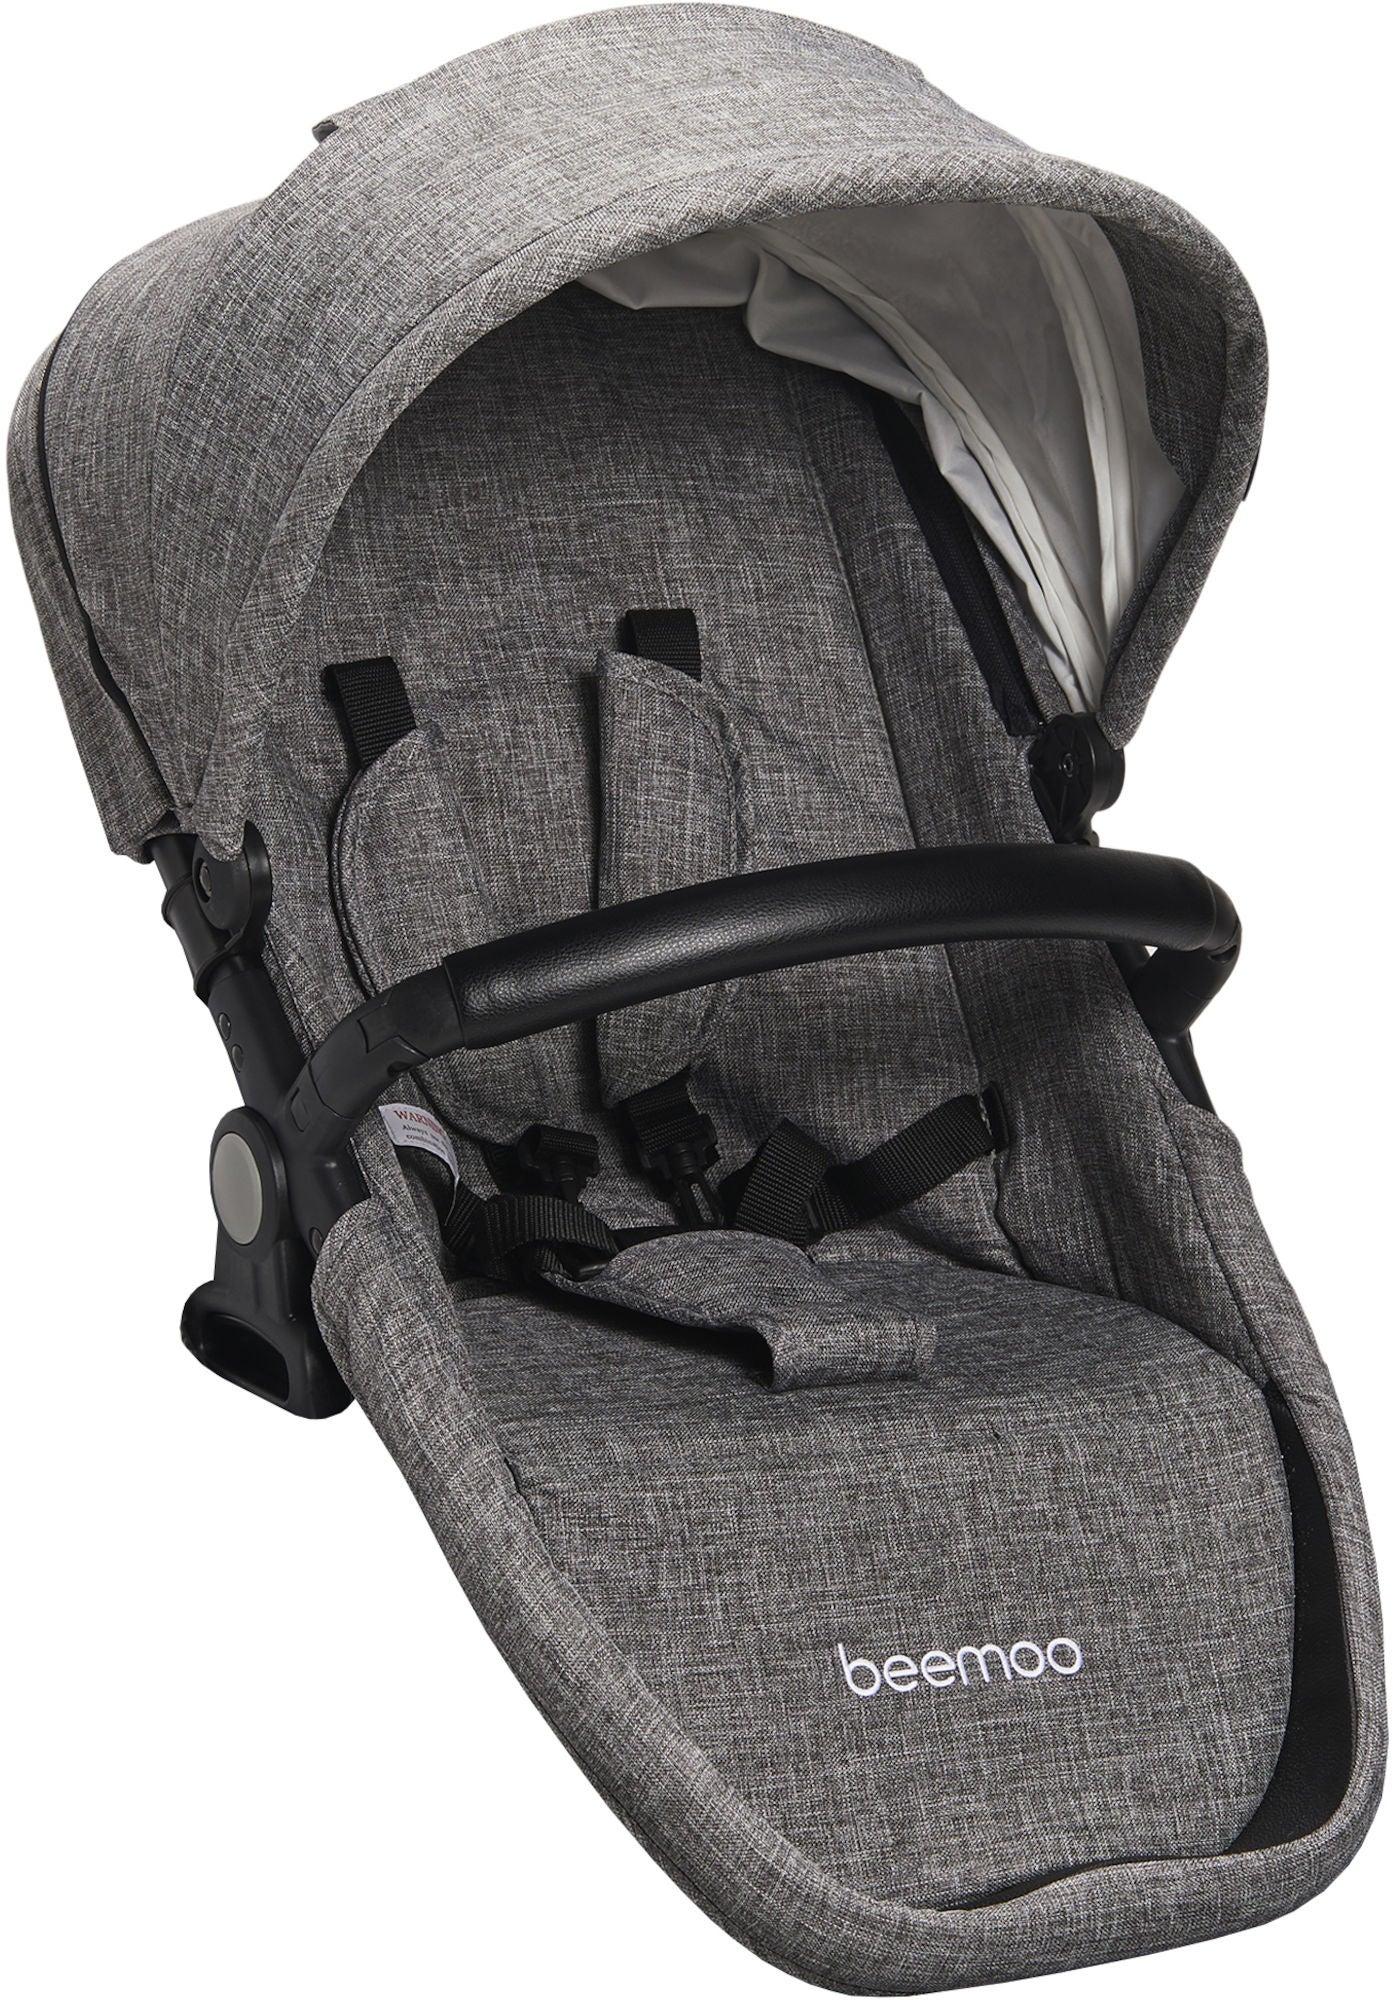 Beemoo Maxi Travel Lux II Sisarusistuin, Silver/Grey Melange